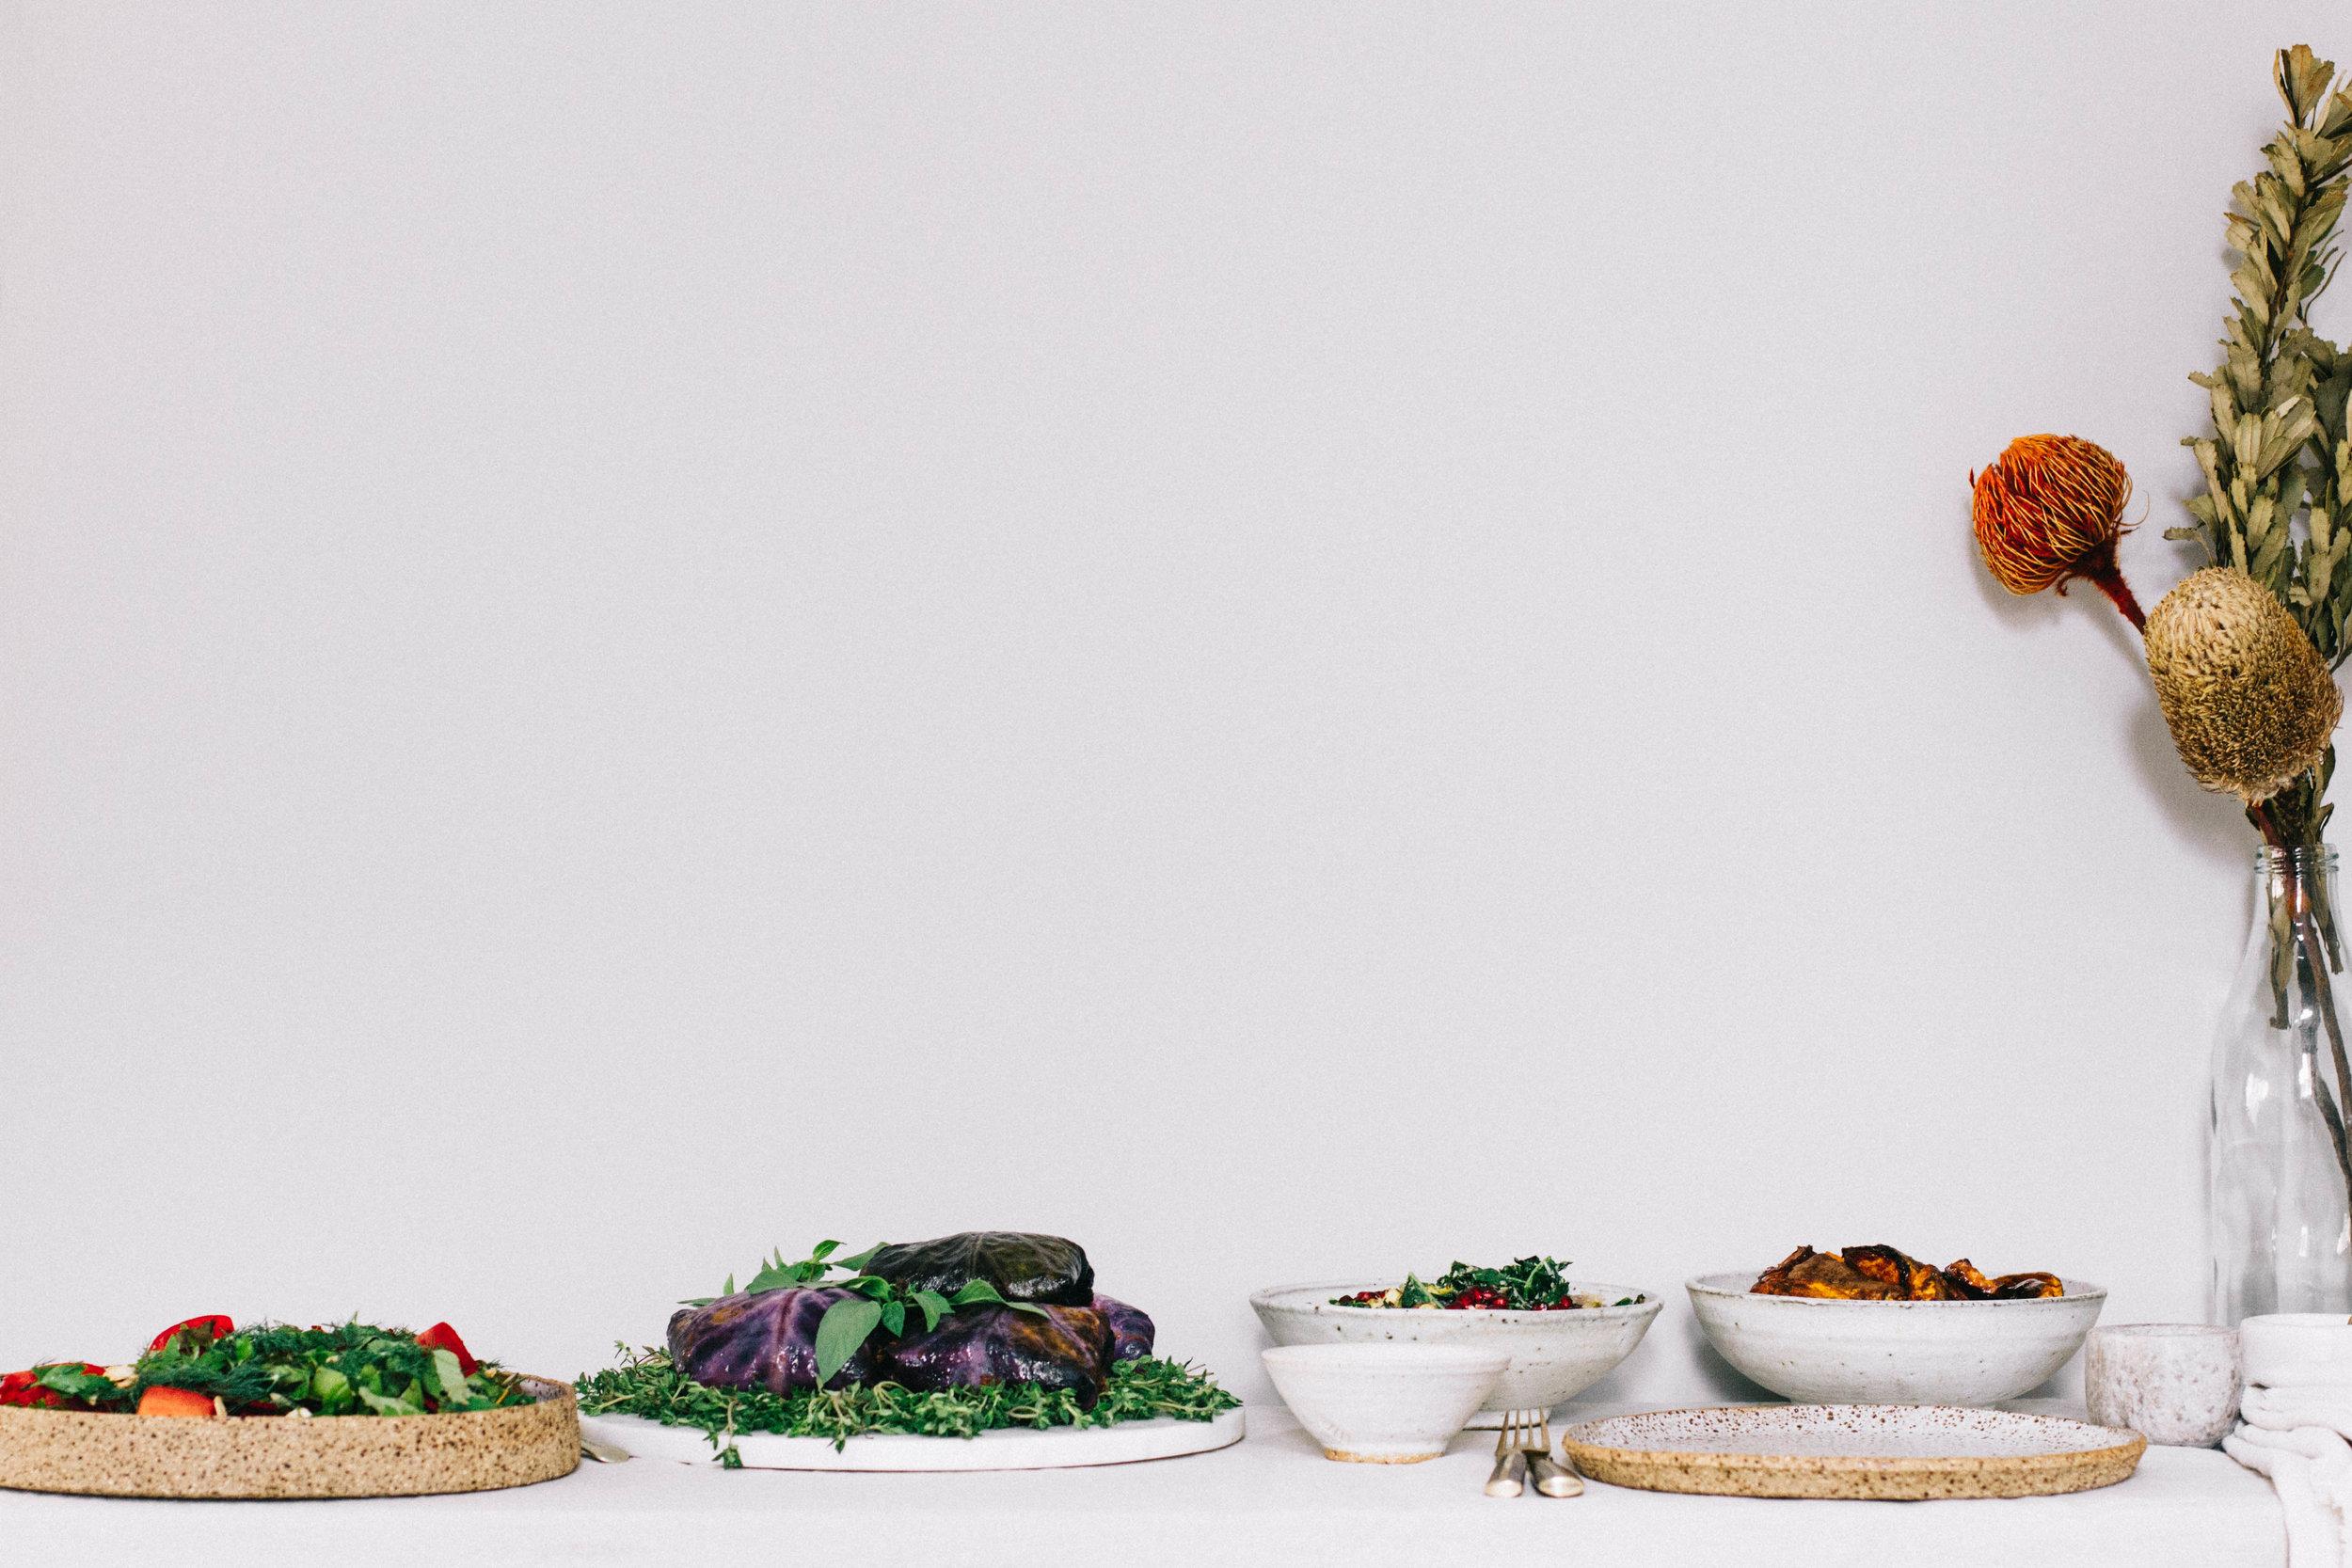 Festive Table⎜The Botanical Kitchen